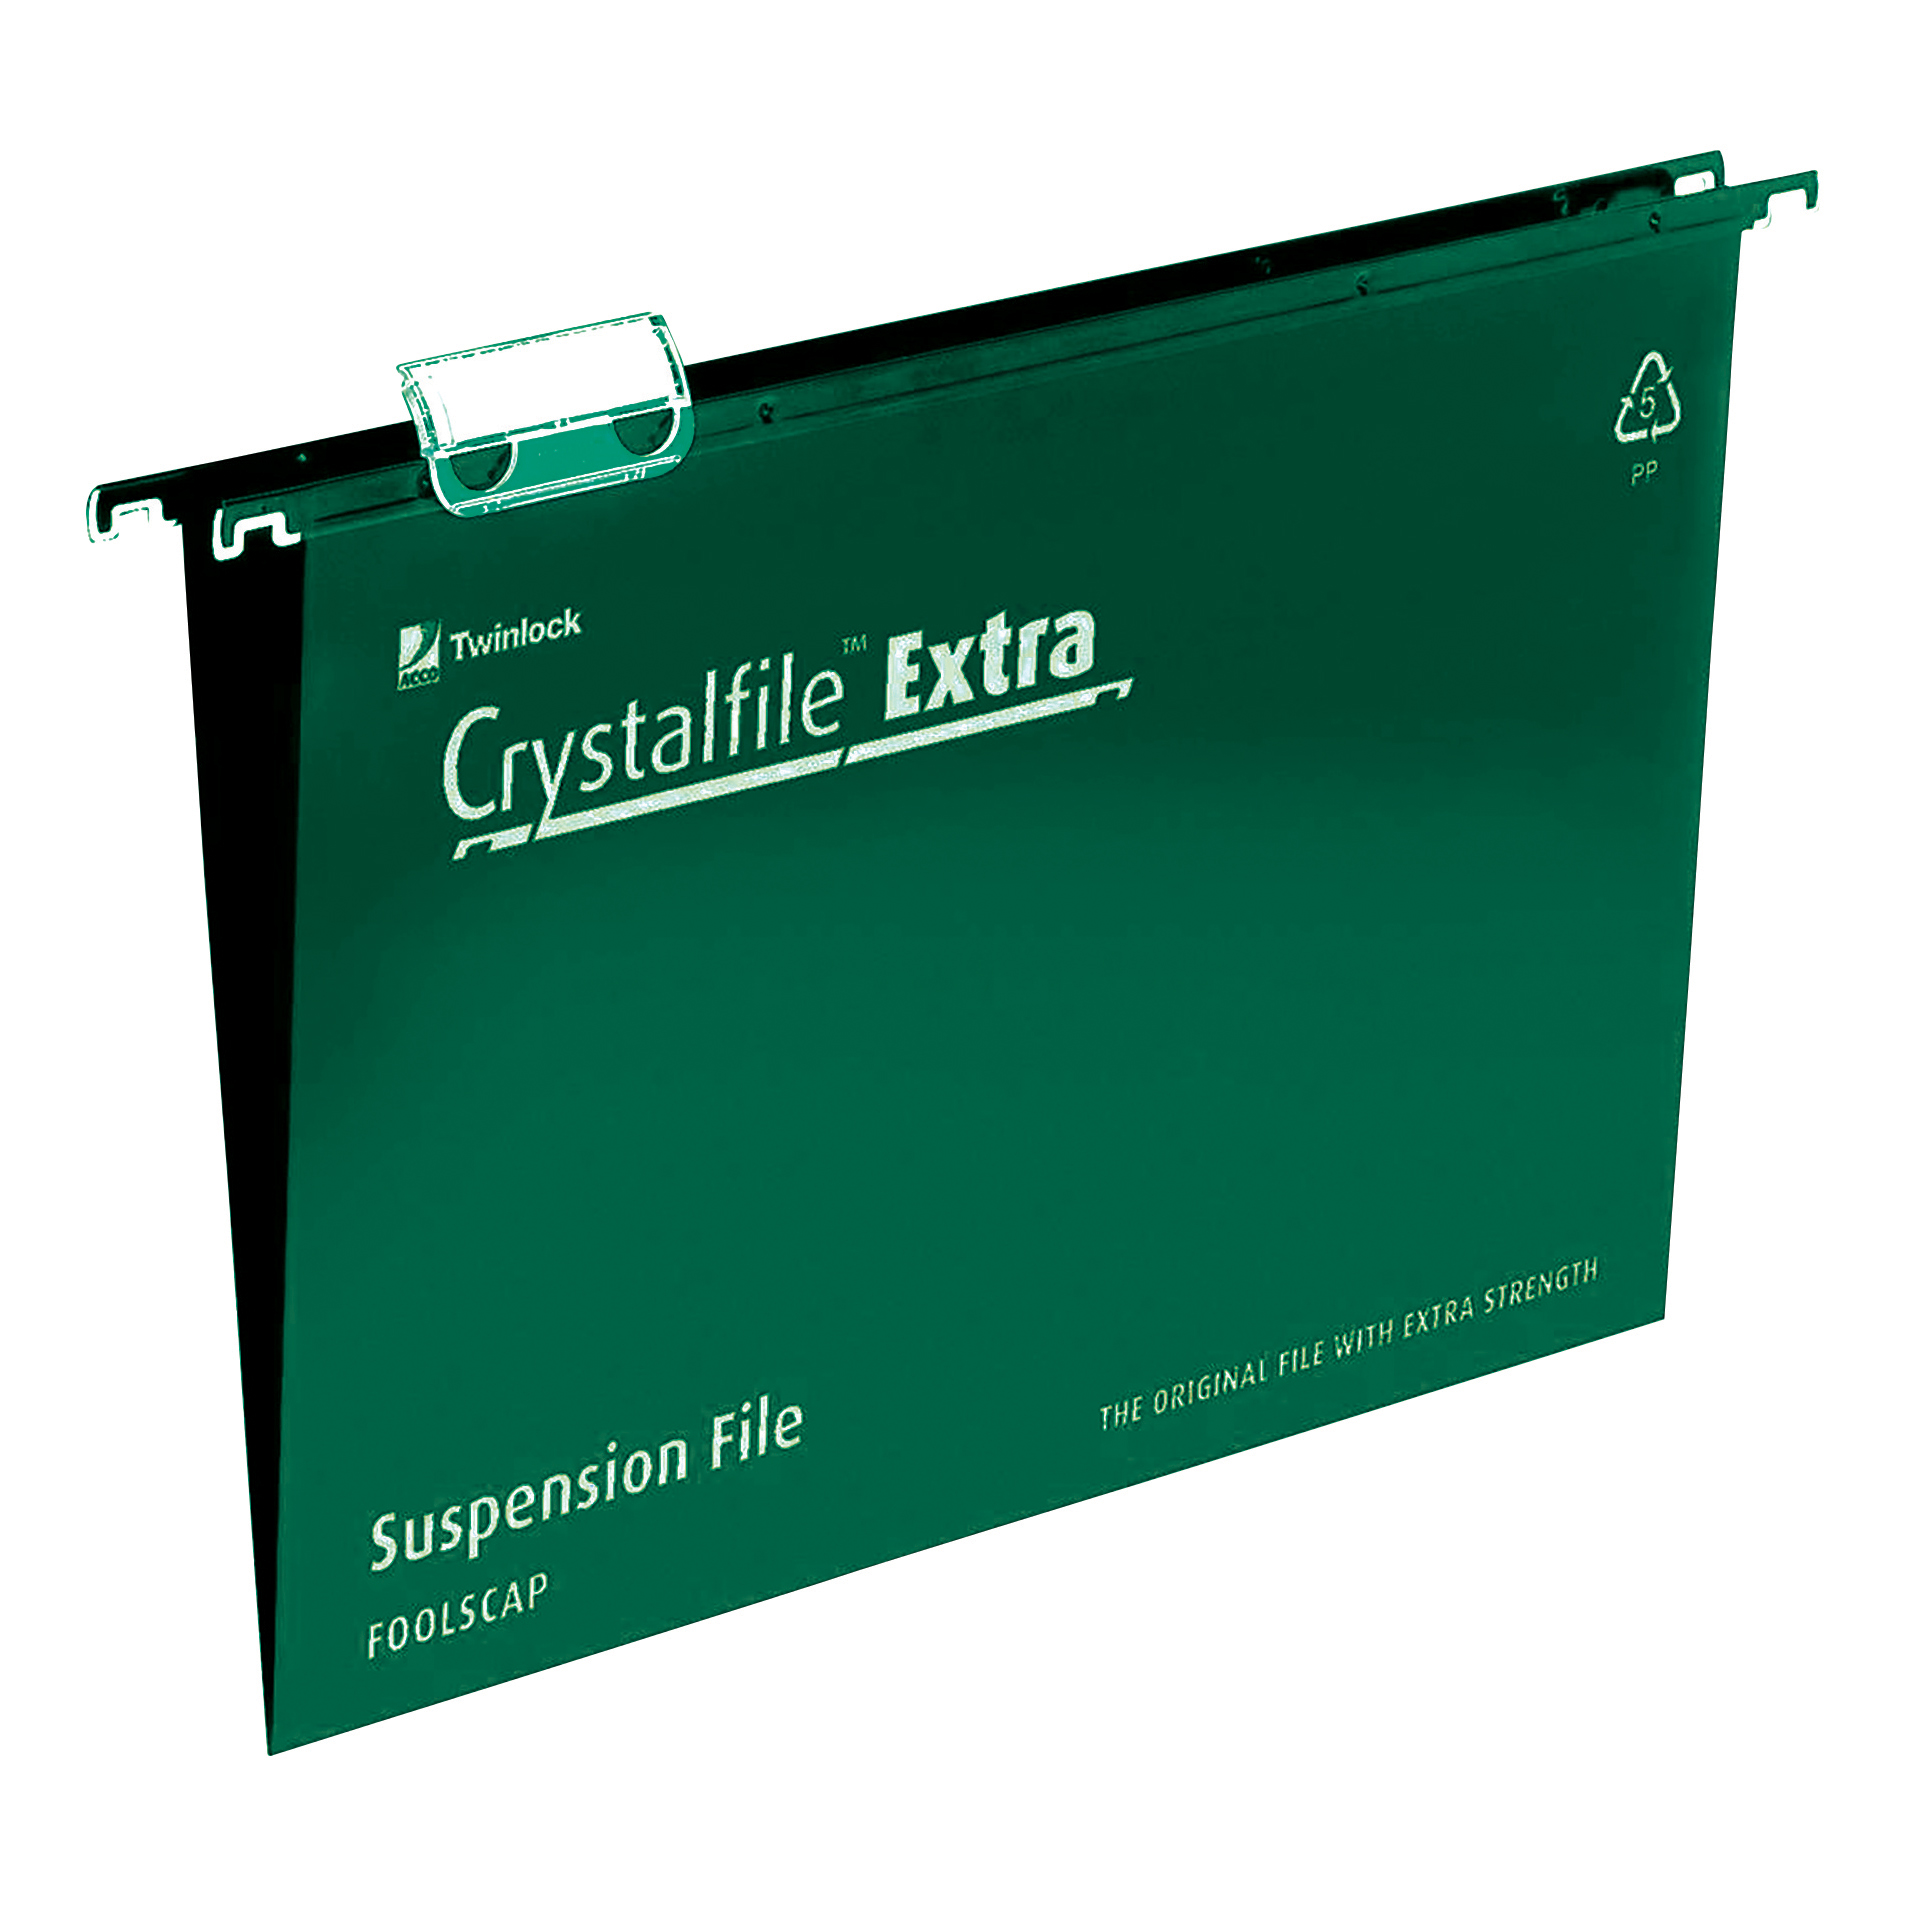 Suspension File Rexel Crystalfile Extra Suspension File Polypropylene 15mm V-base A4 Green Ref 70634 Pack 25